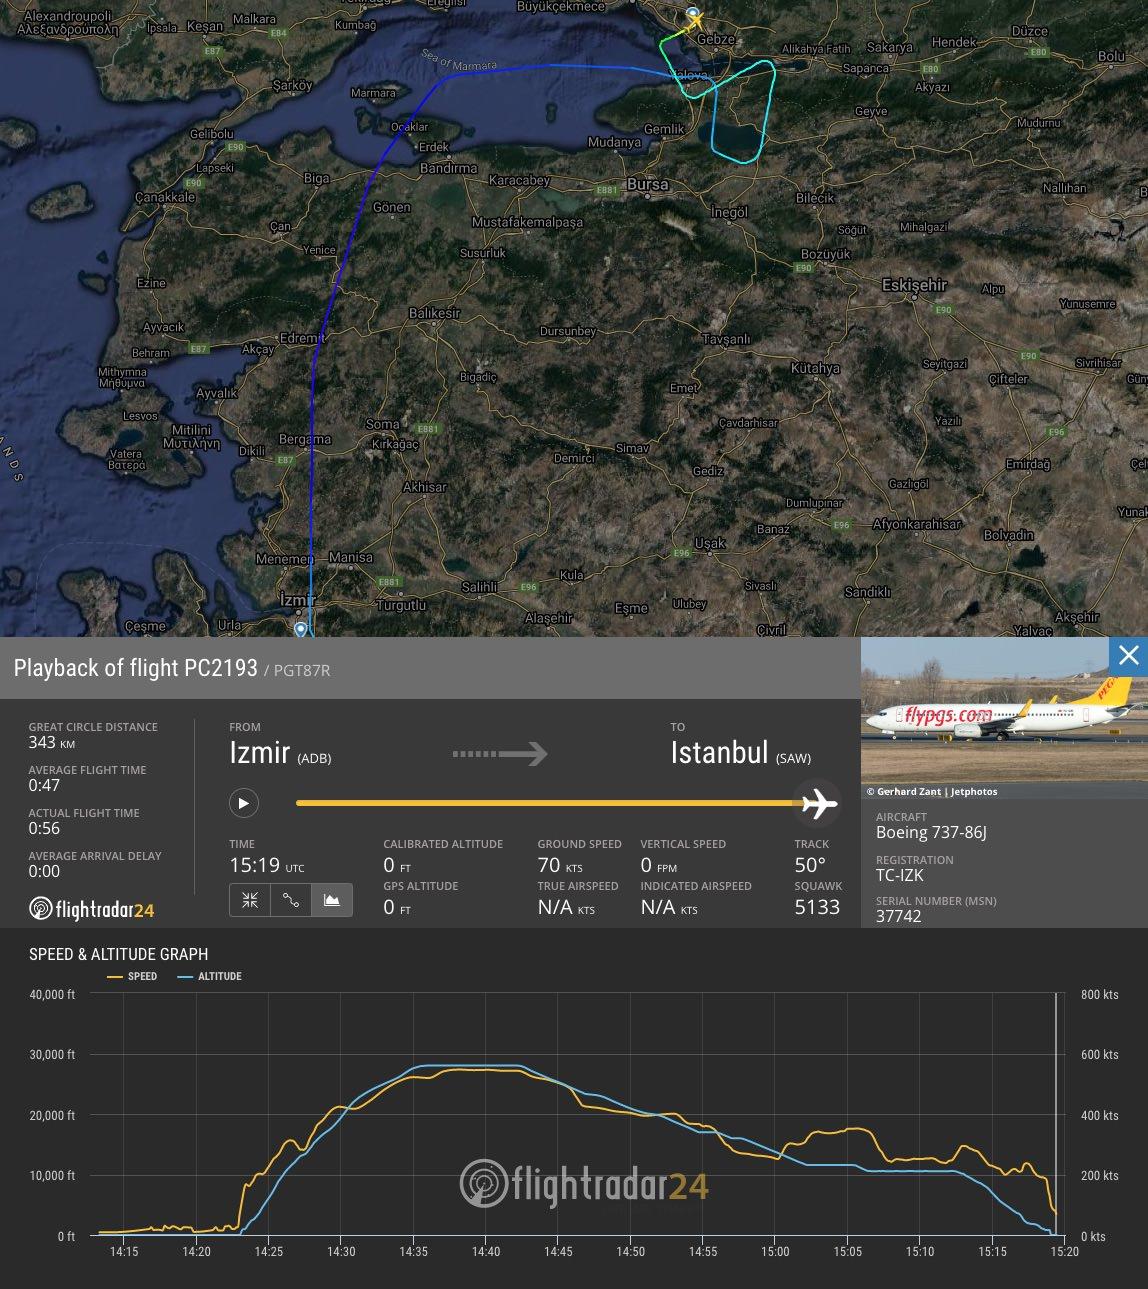 PC2193 Full flight path